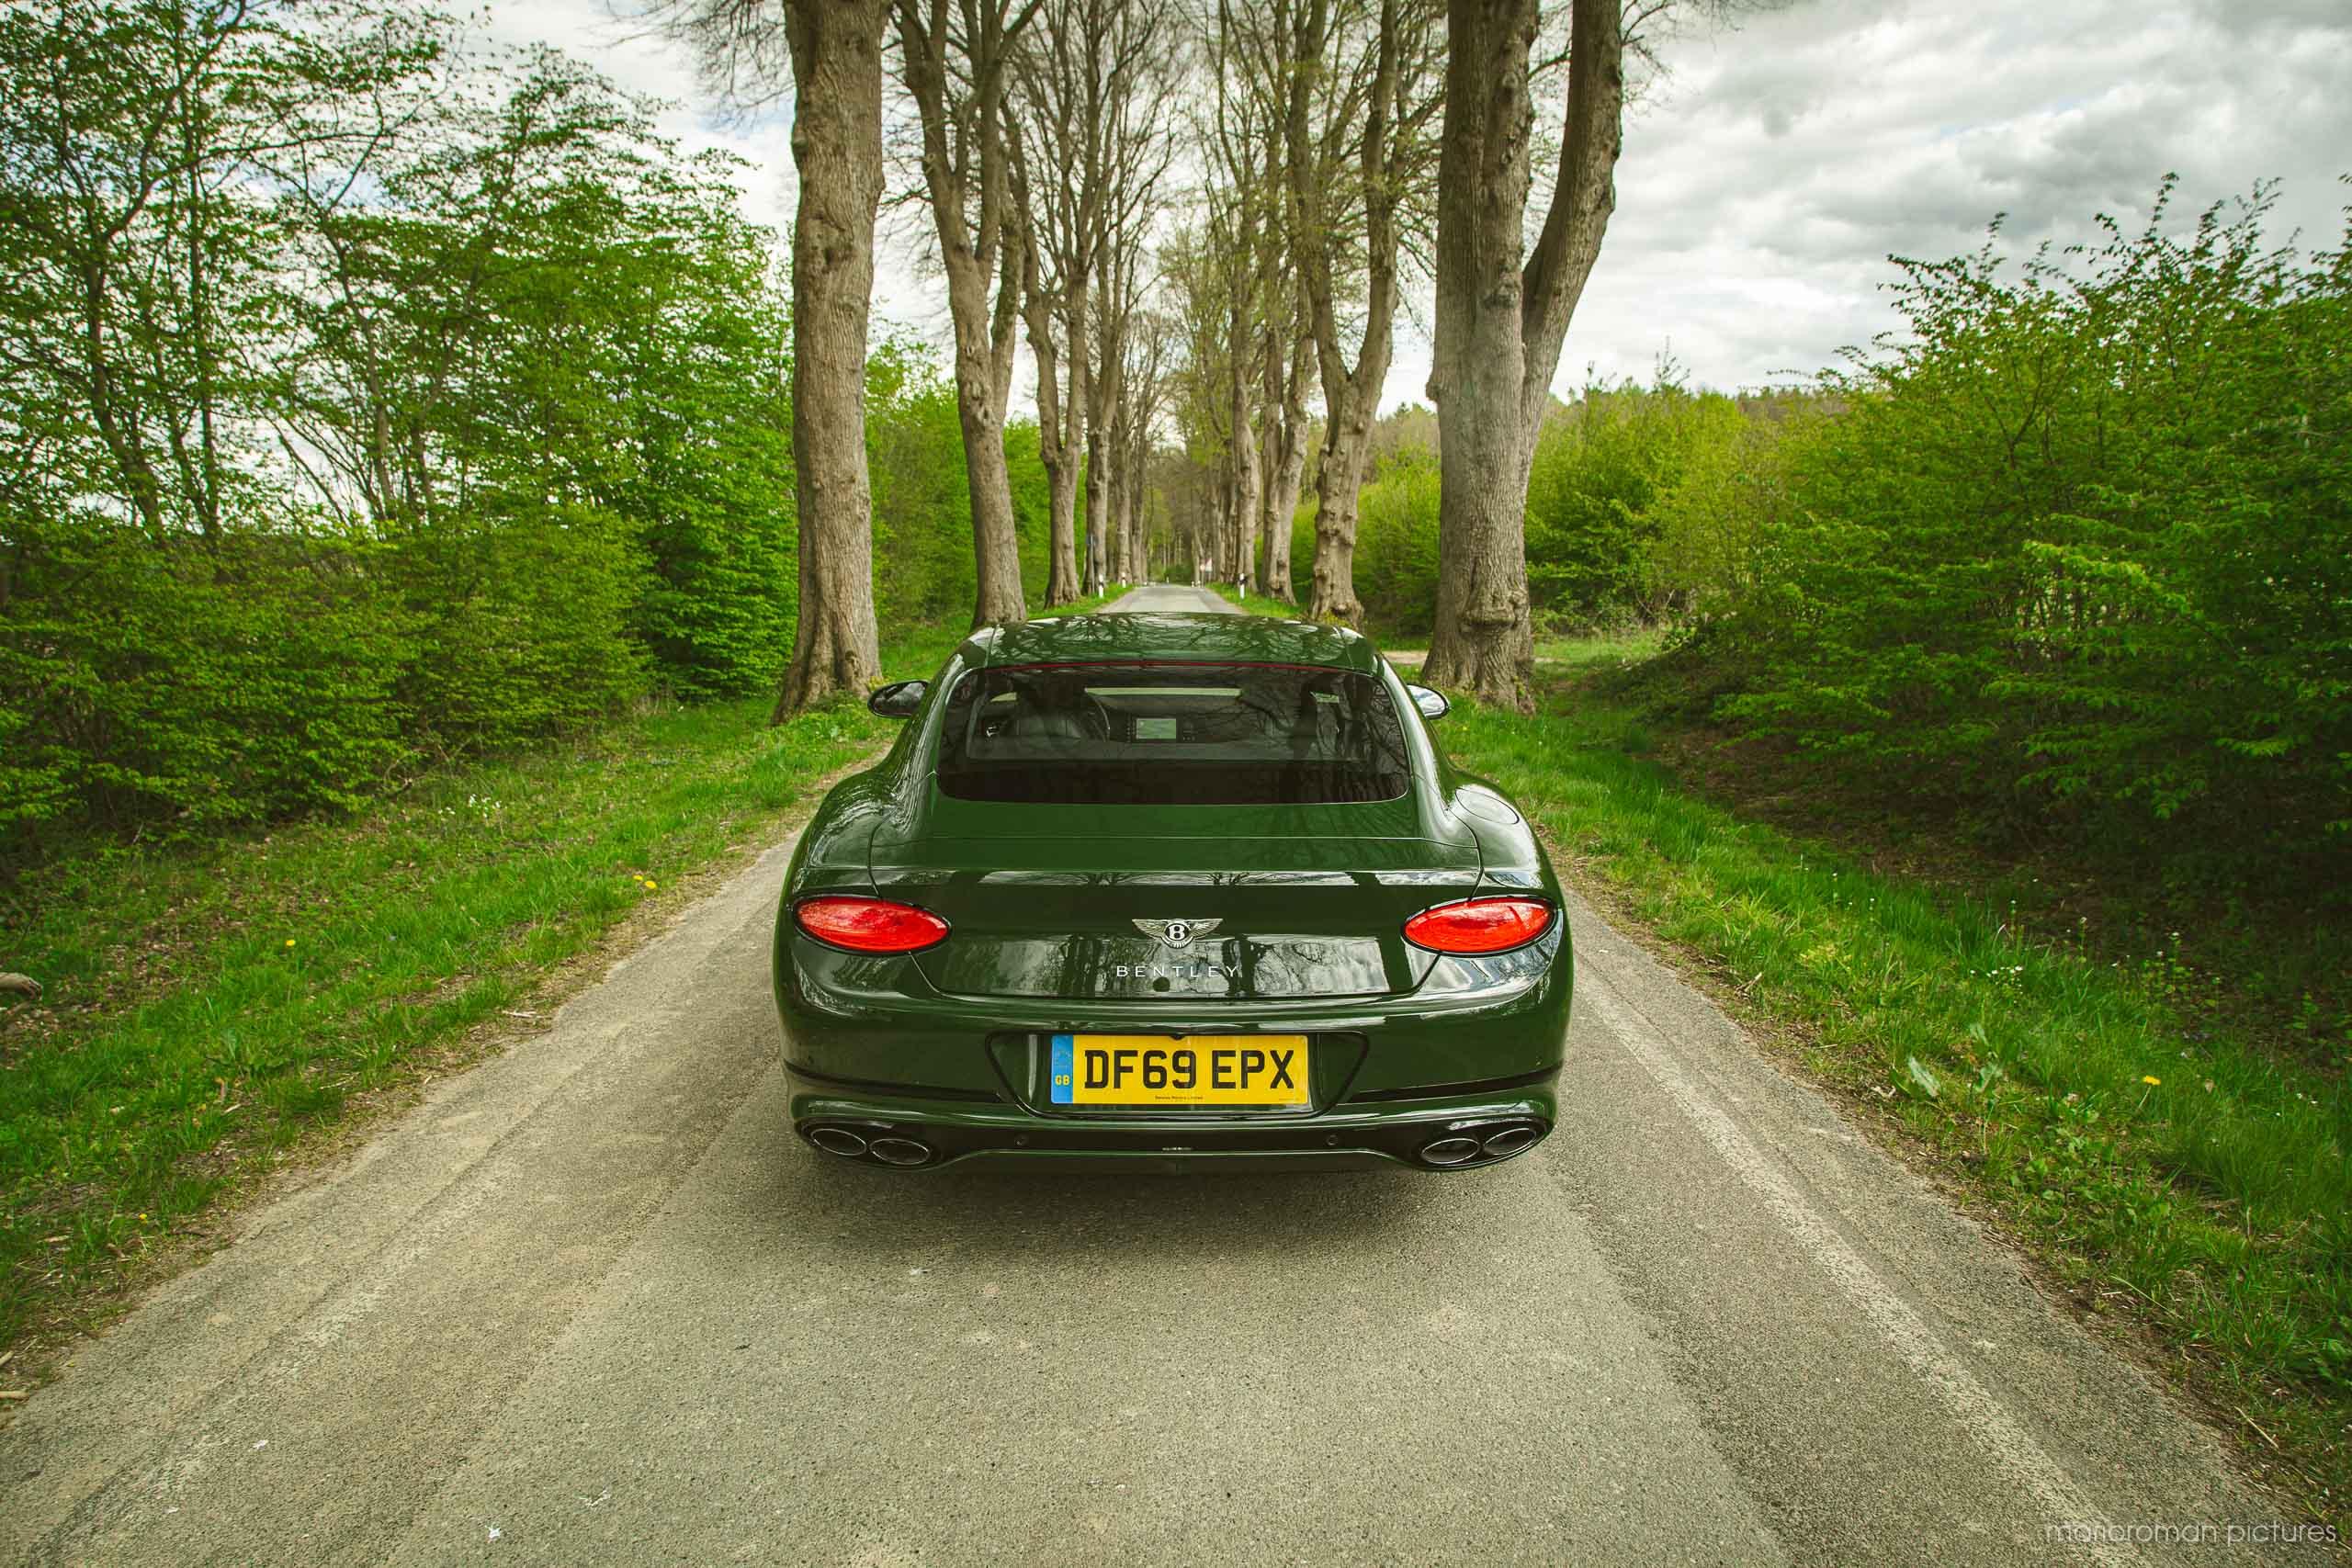 2020 Bentley Continental GT V8 | Fanaticar Magazin / MarioRoman Pictures